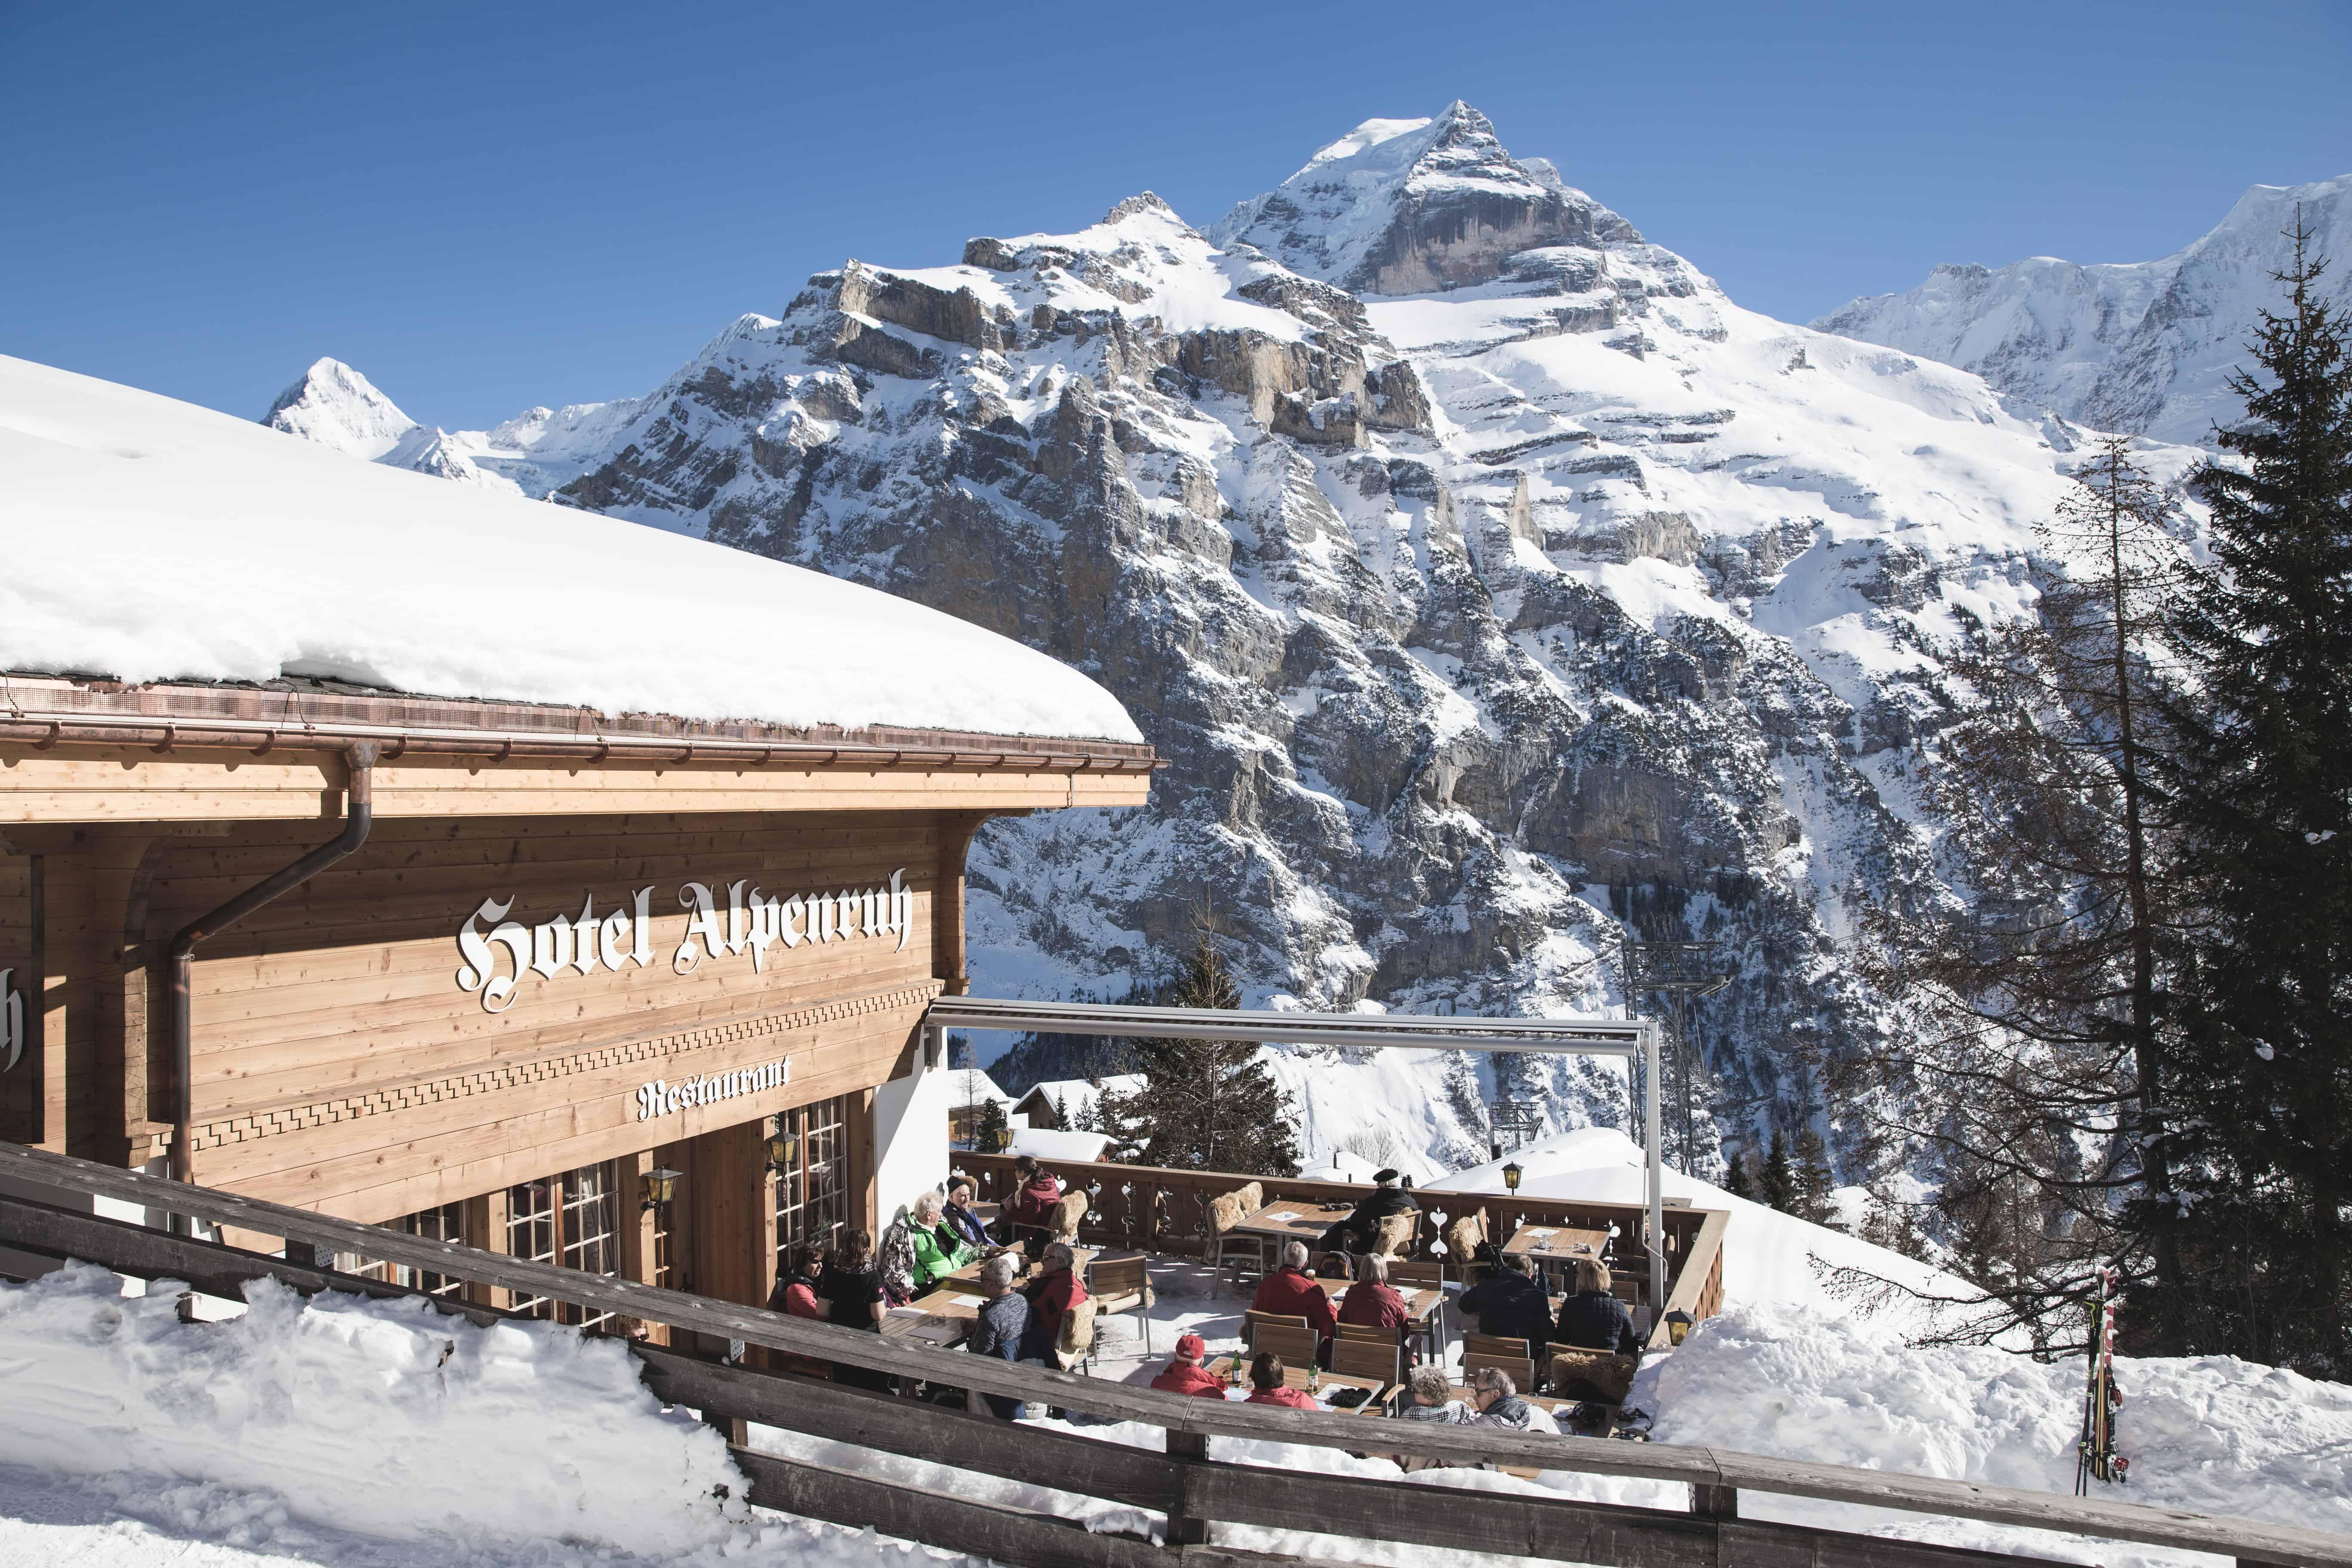 Hotel Alpernath is a good spot to get a rösti in Mürren, a ski town in the Swiss Alps